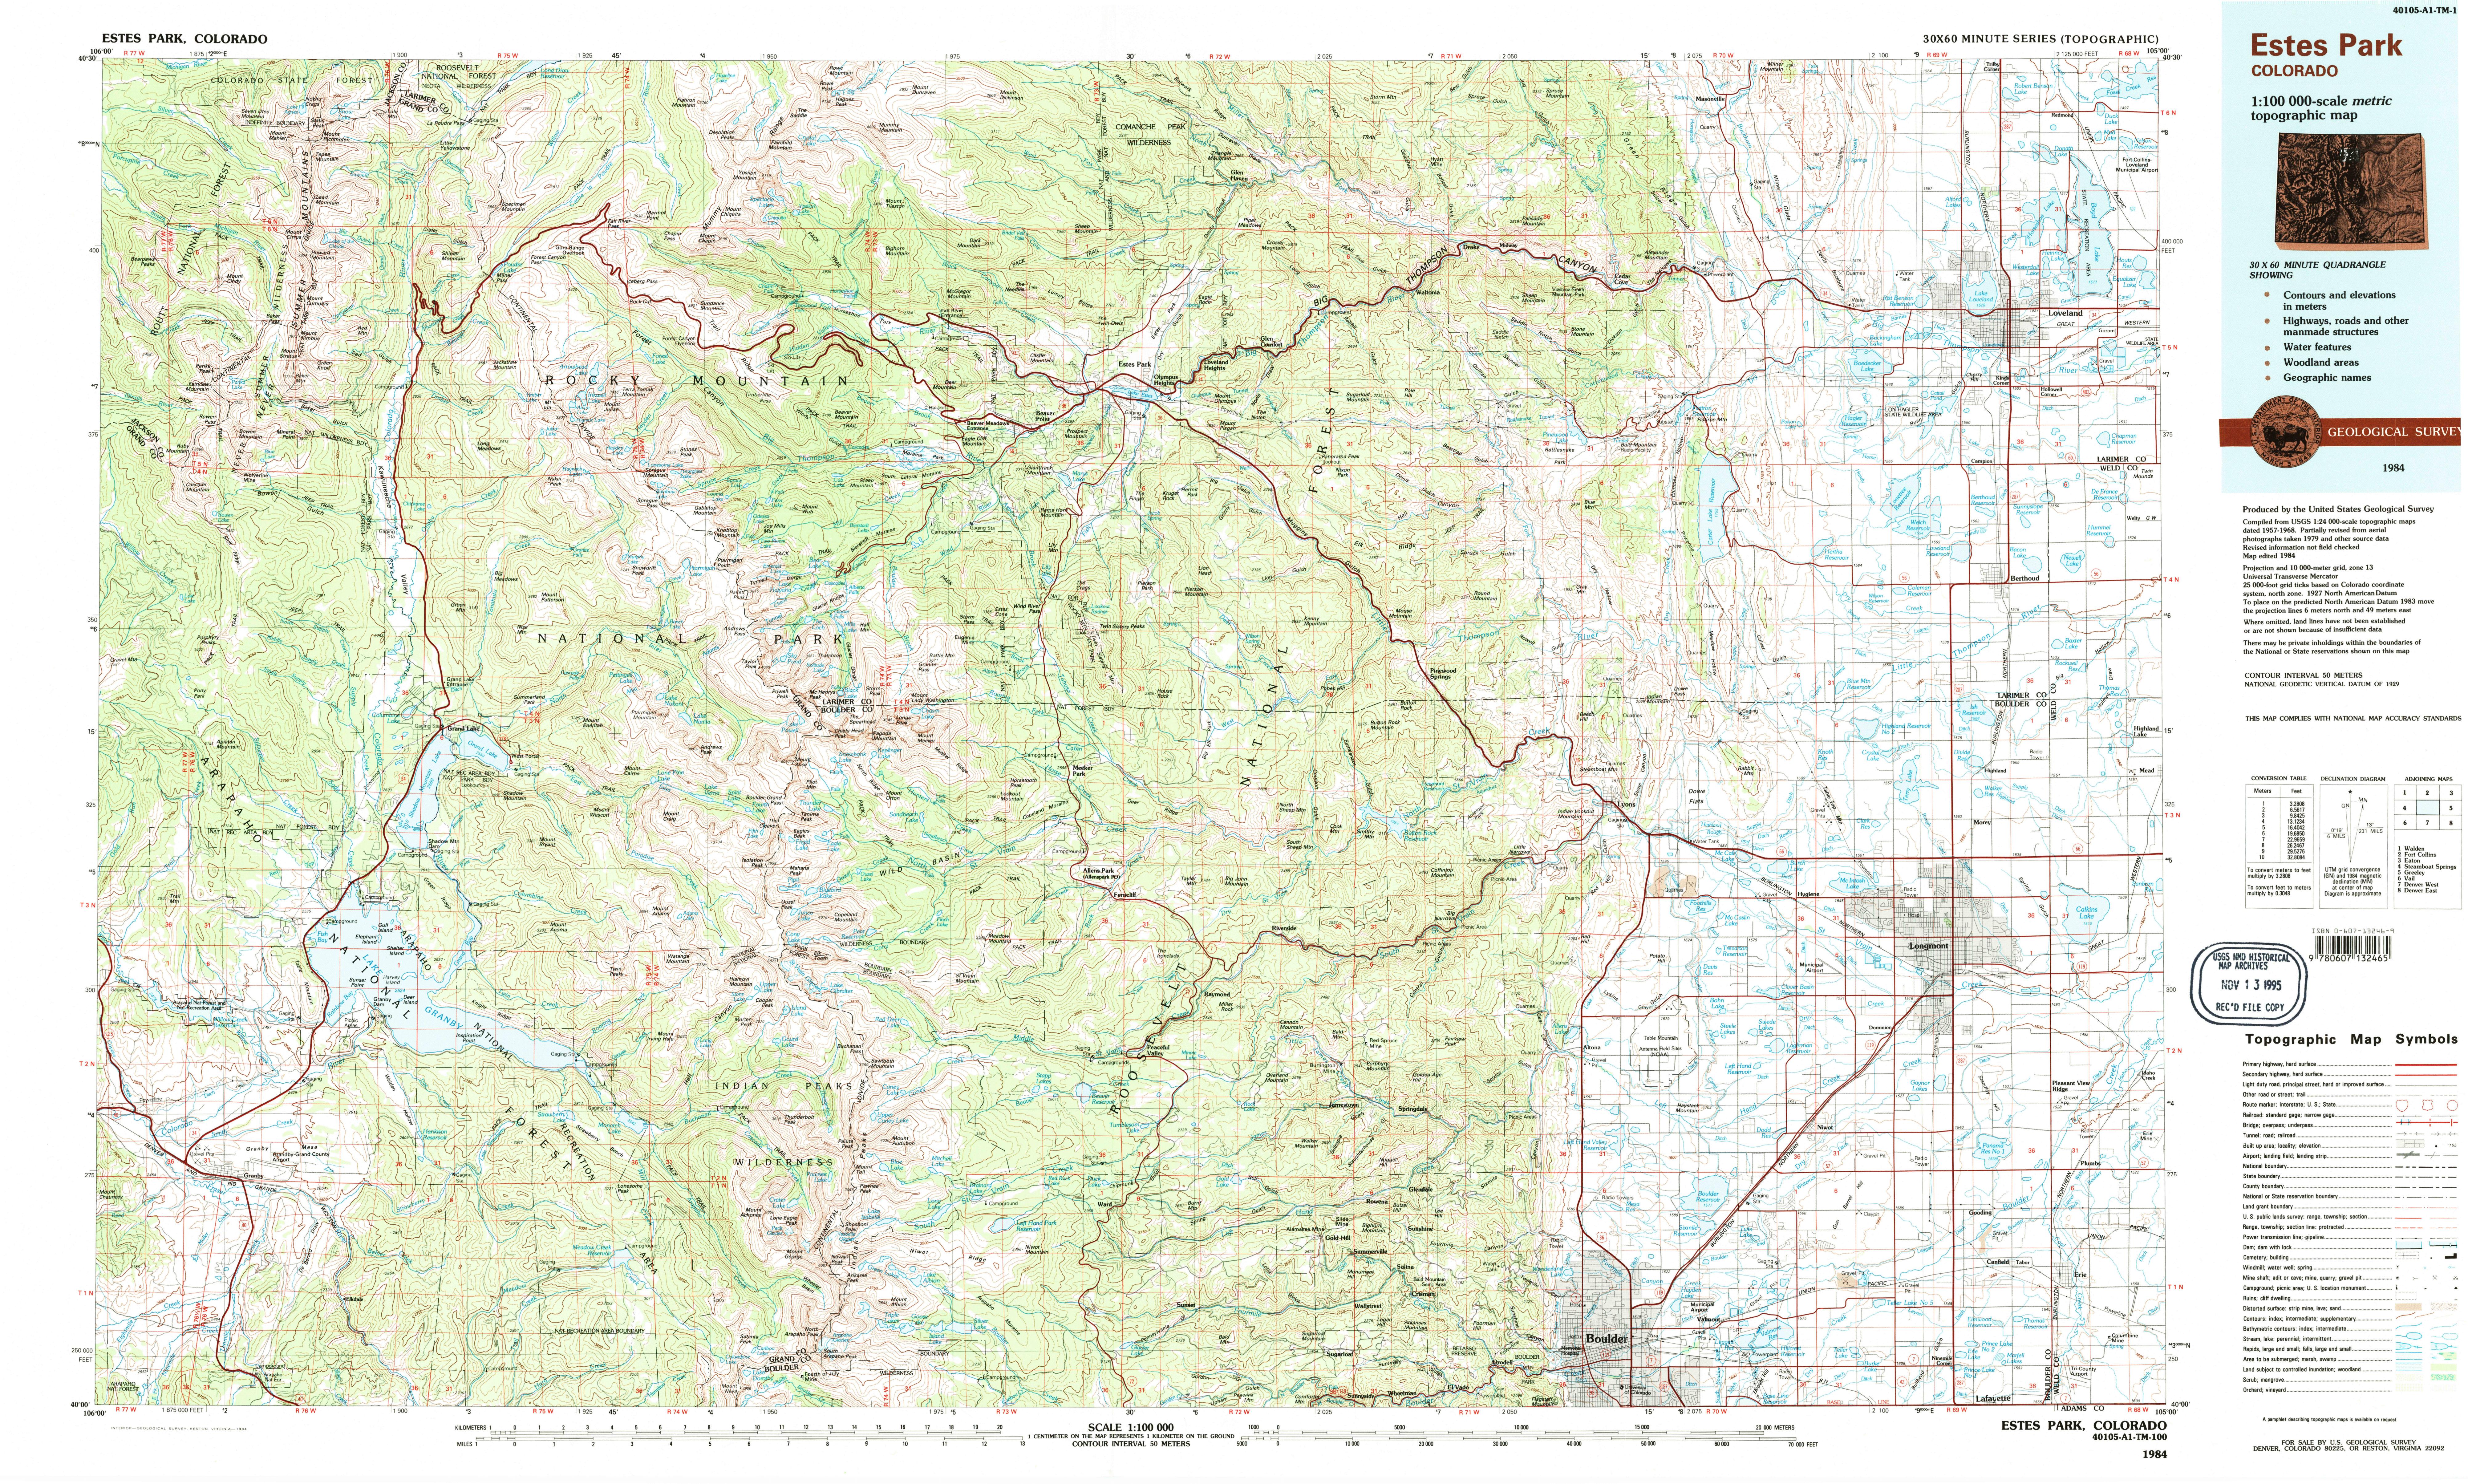 FileNPS Rockymountaintopomapjpg Wikimedia Commons - Colorado topo maps